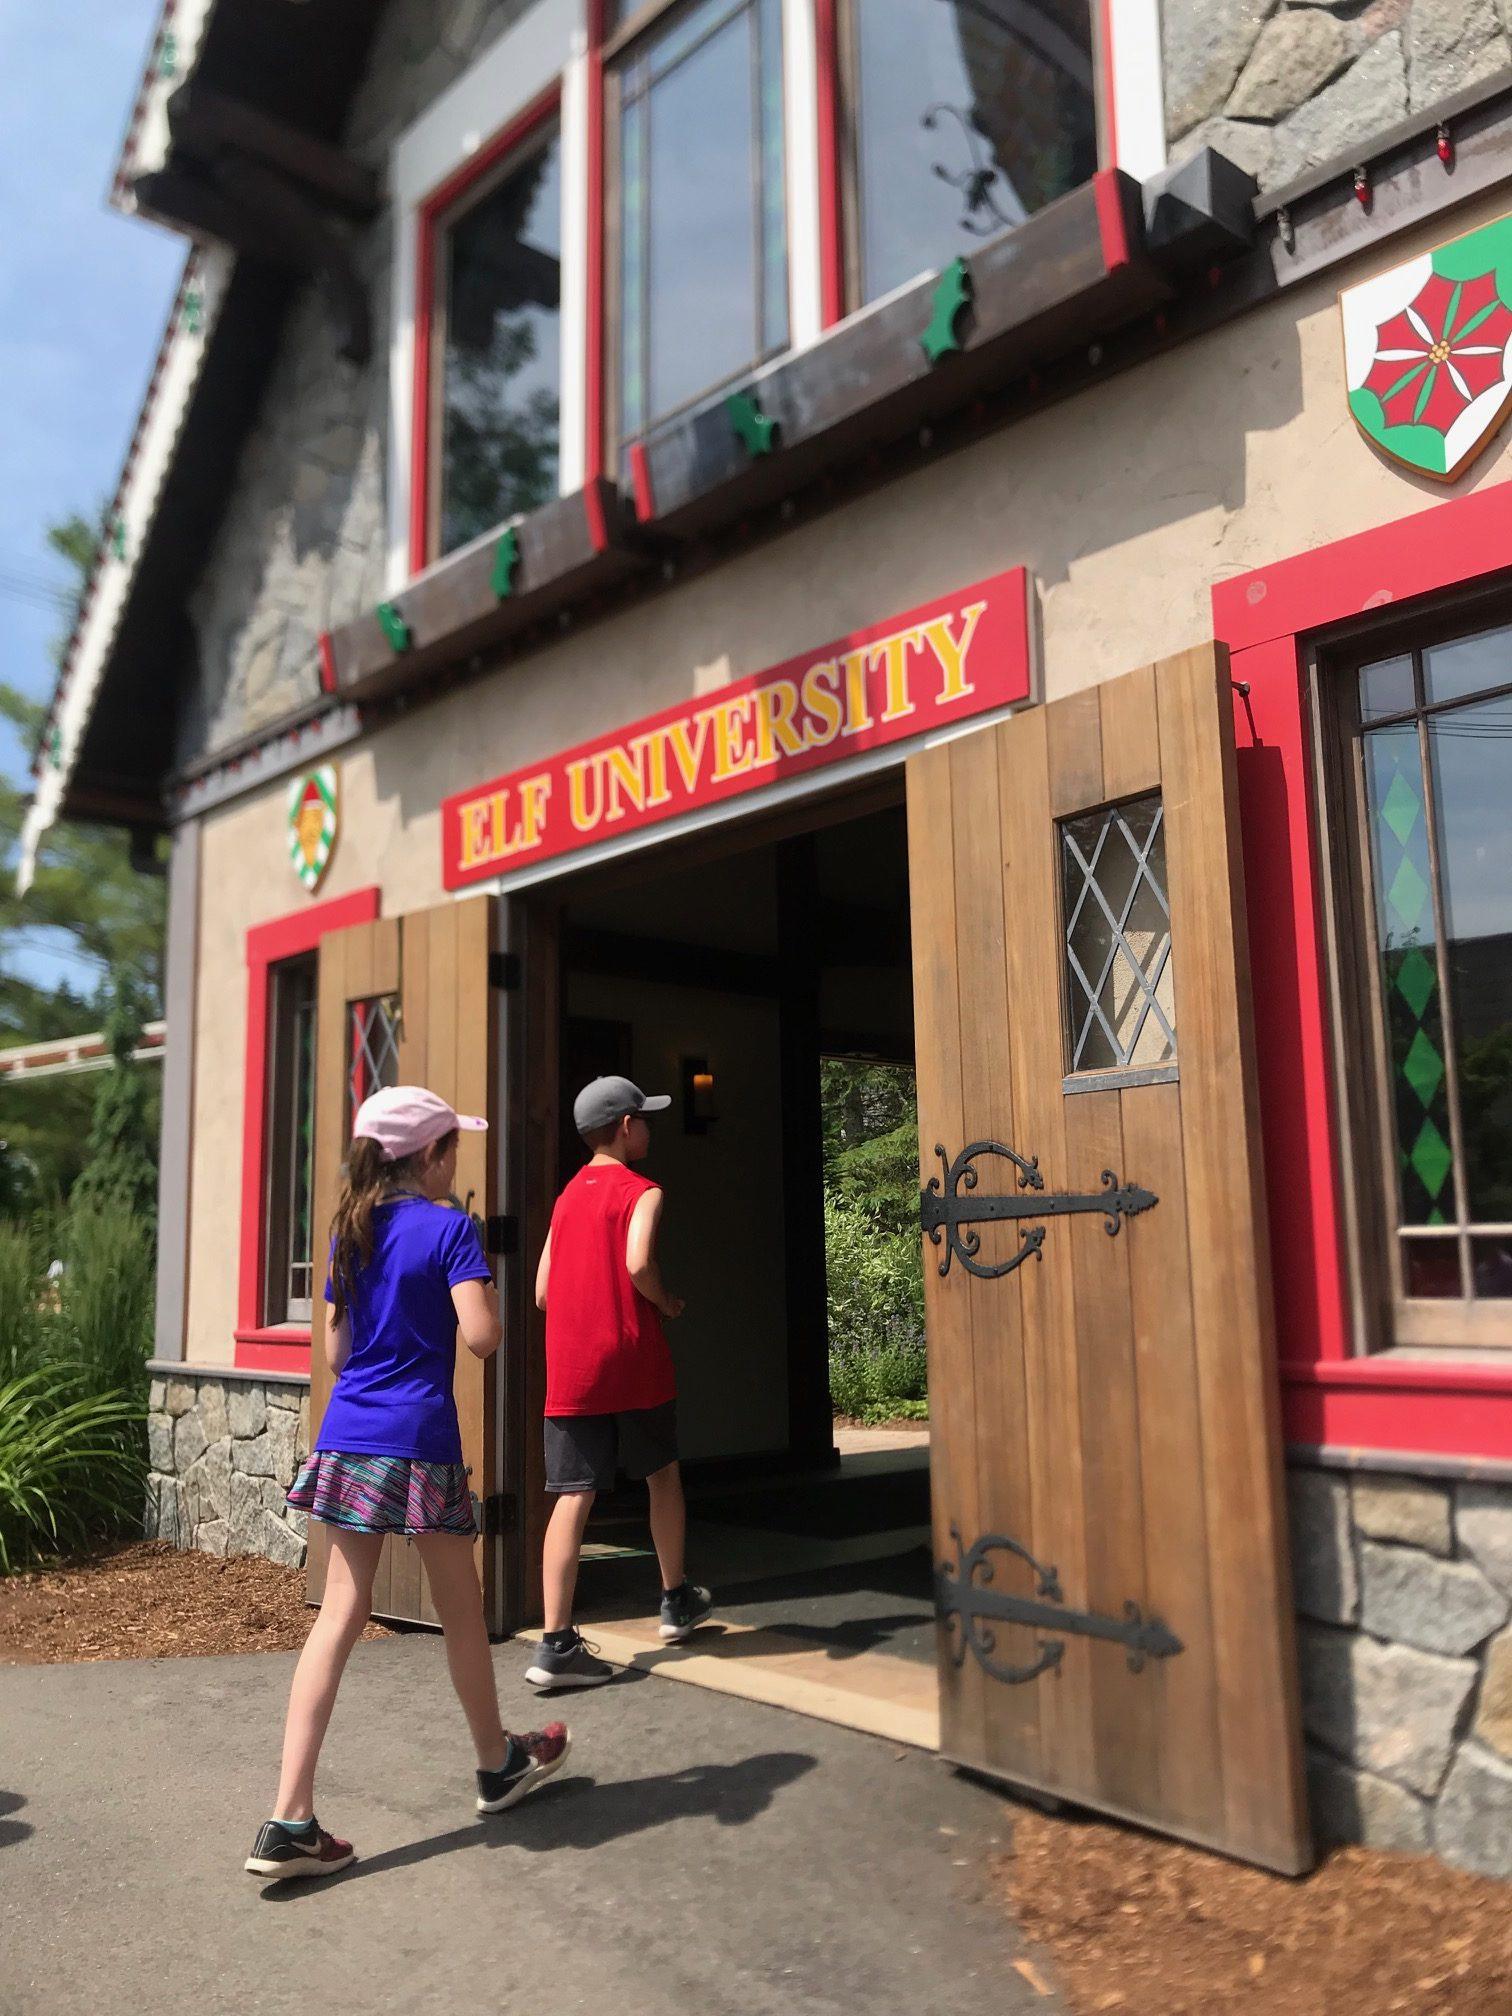 Elf University at Santa's Village